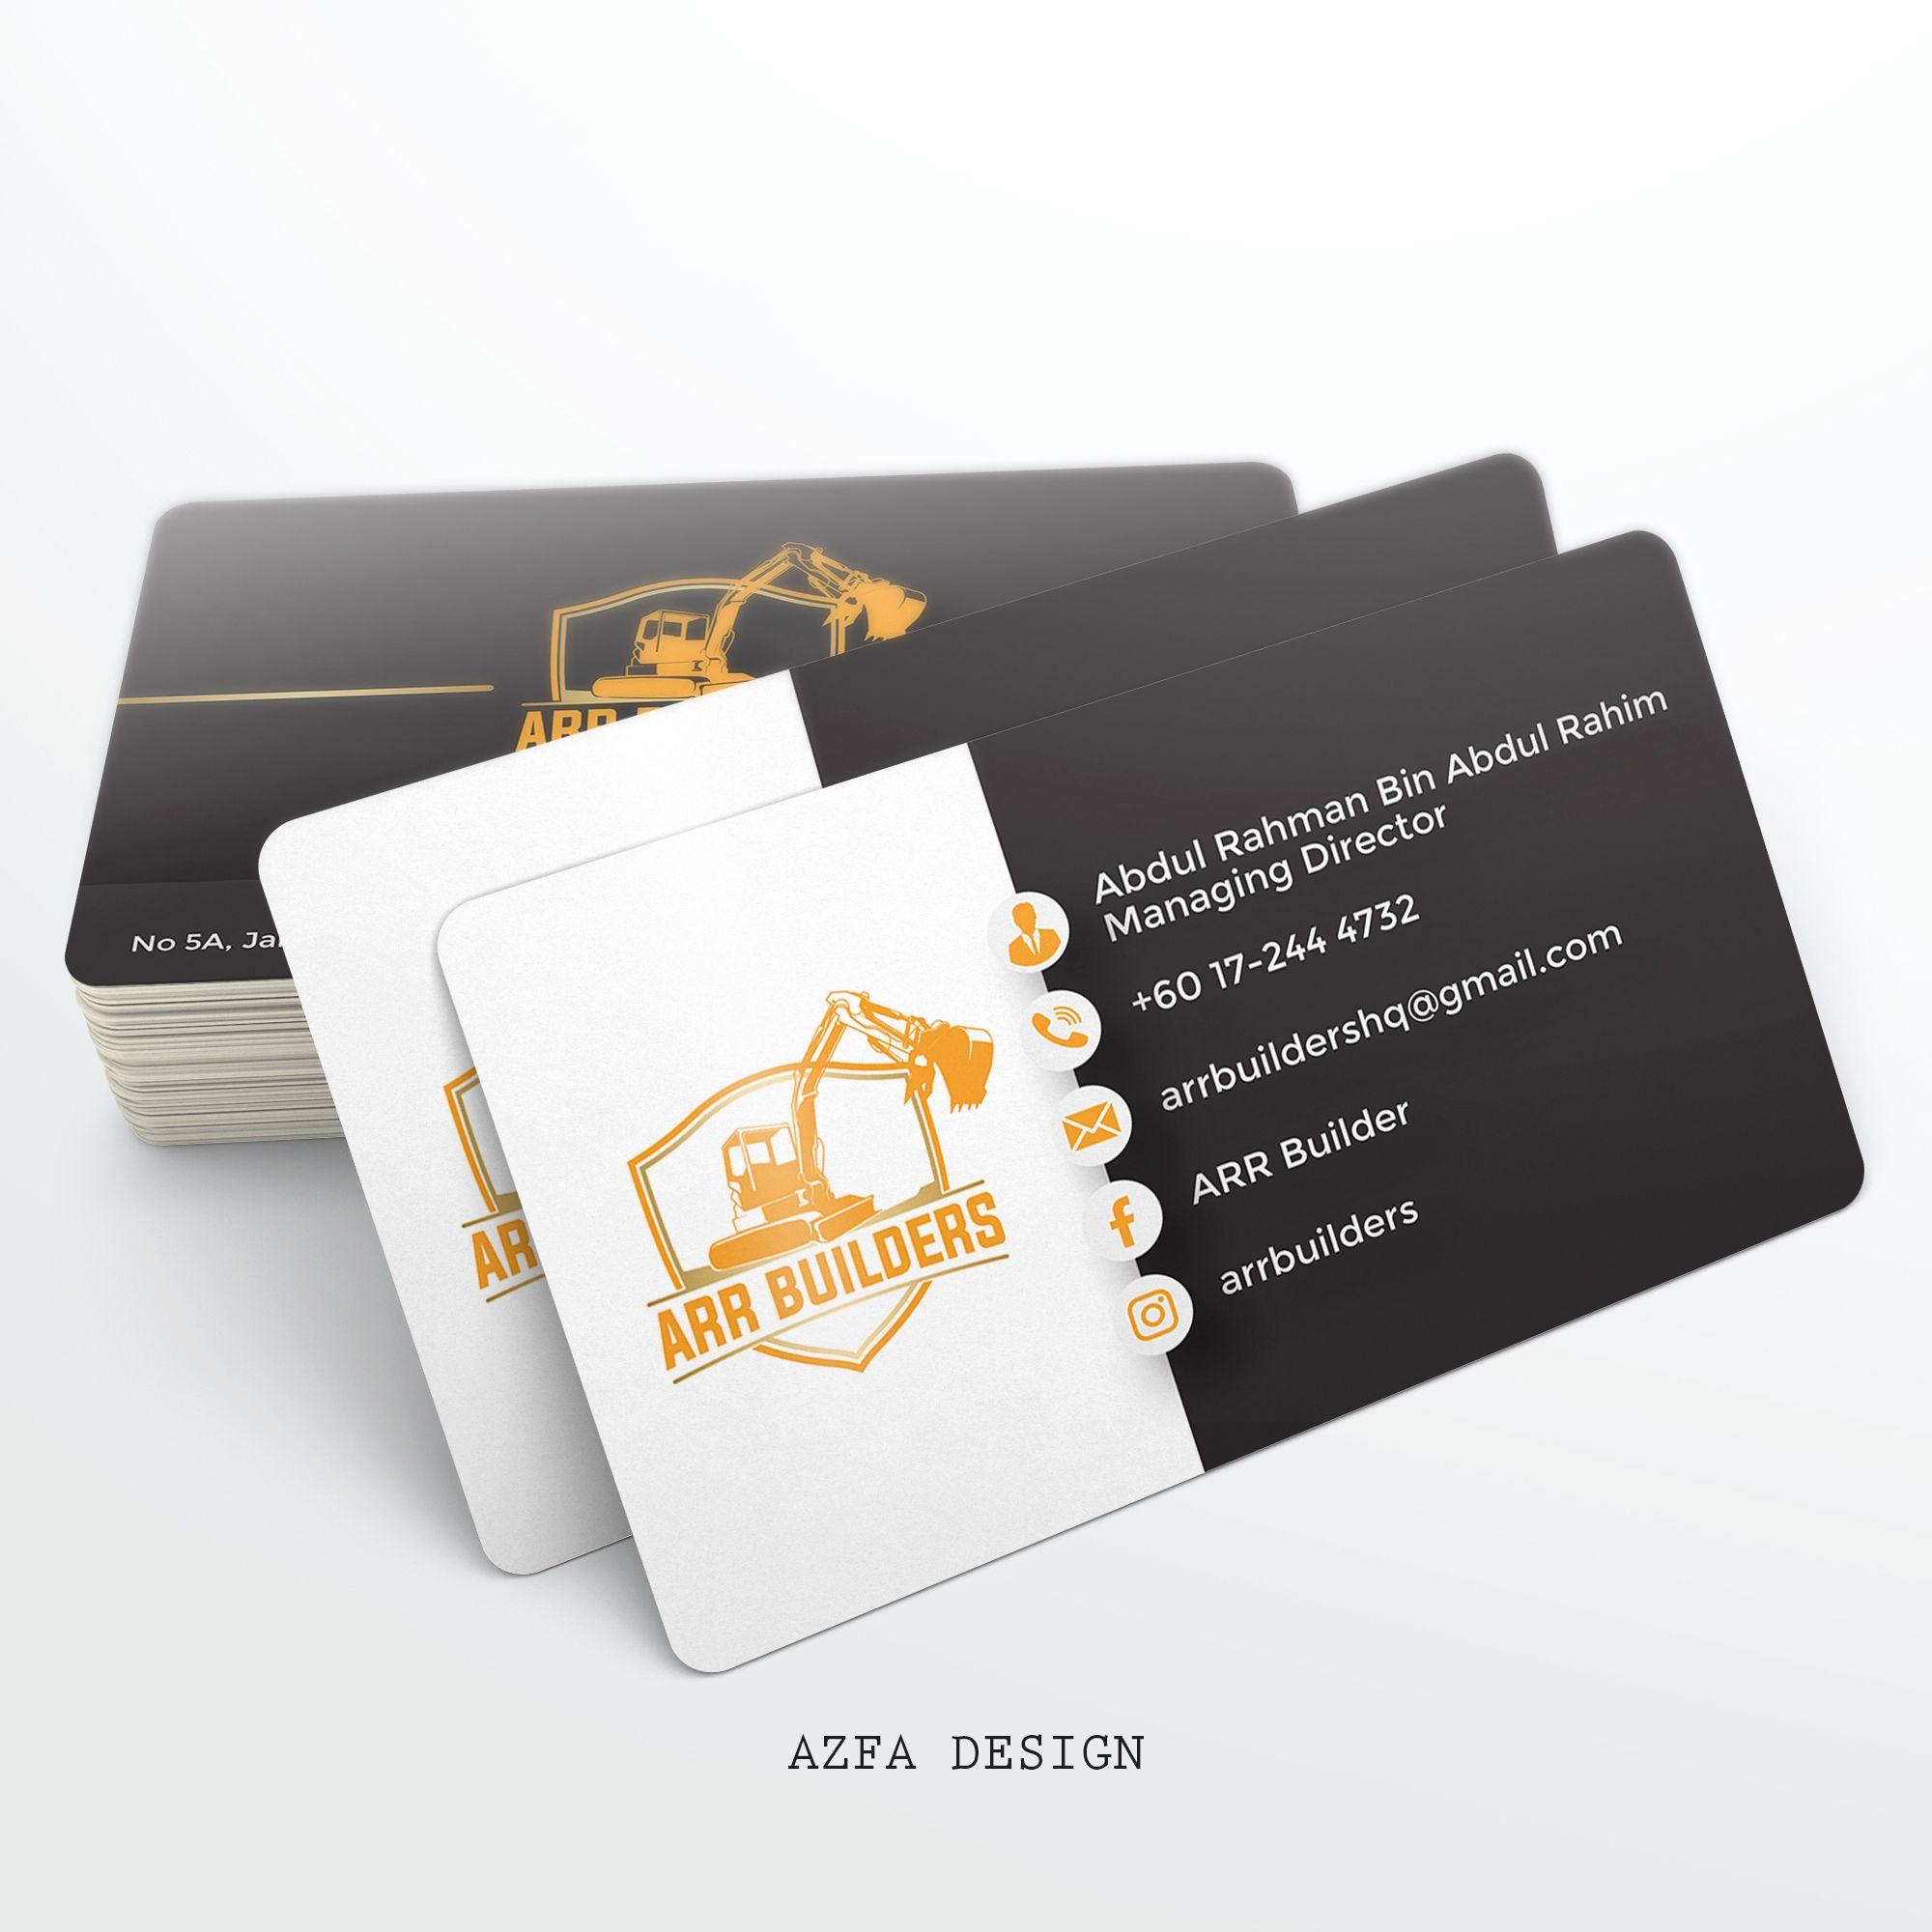 Azfadesign Bisneskaddesign Siapa Kata Bisnes Kad Ni Sesuai Untuk Para Peniaga Sahaja Ha Salah Tanggapan Anda Tu Tau Act Cards Business Cards Messages